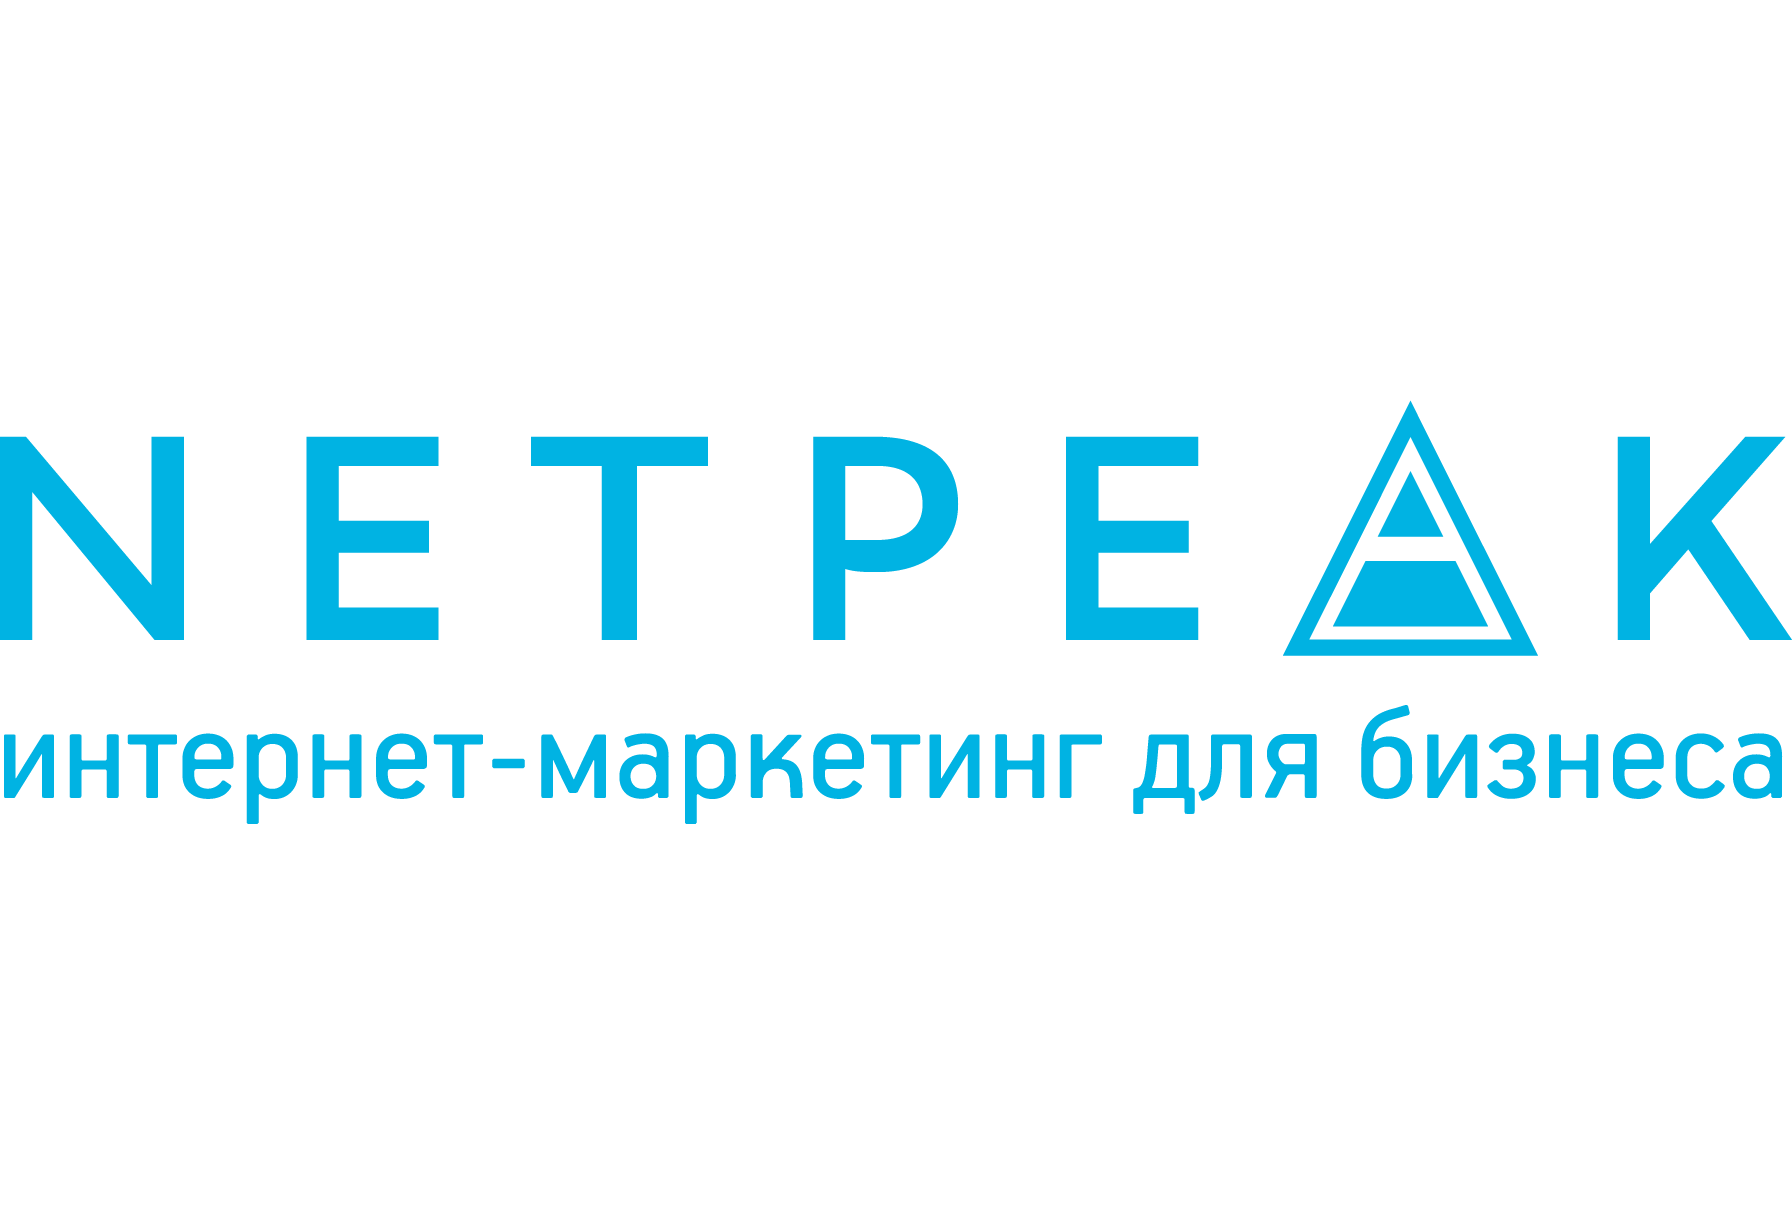 NETPEAK - интернет-маркетинг для бизнеса